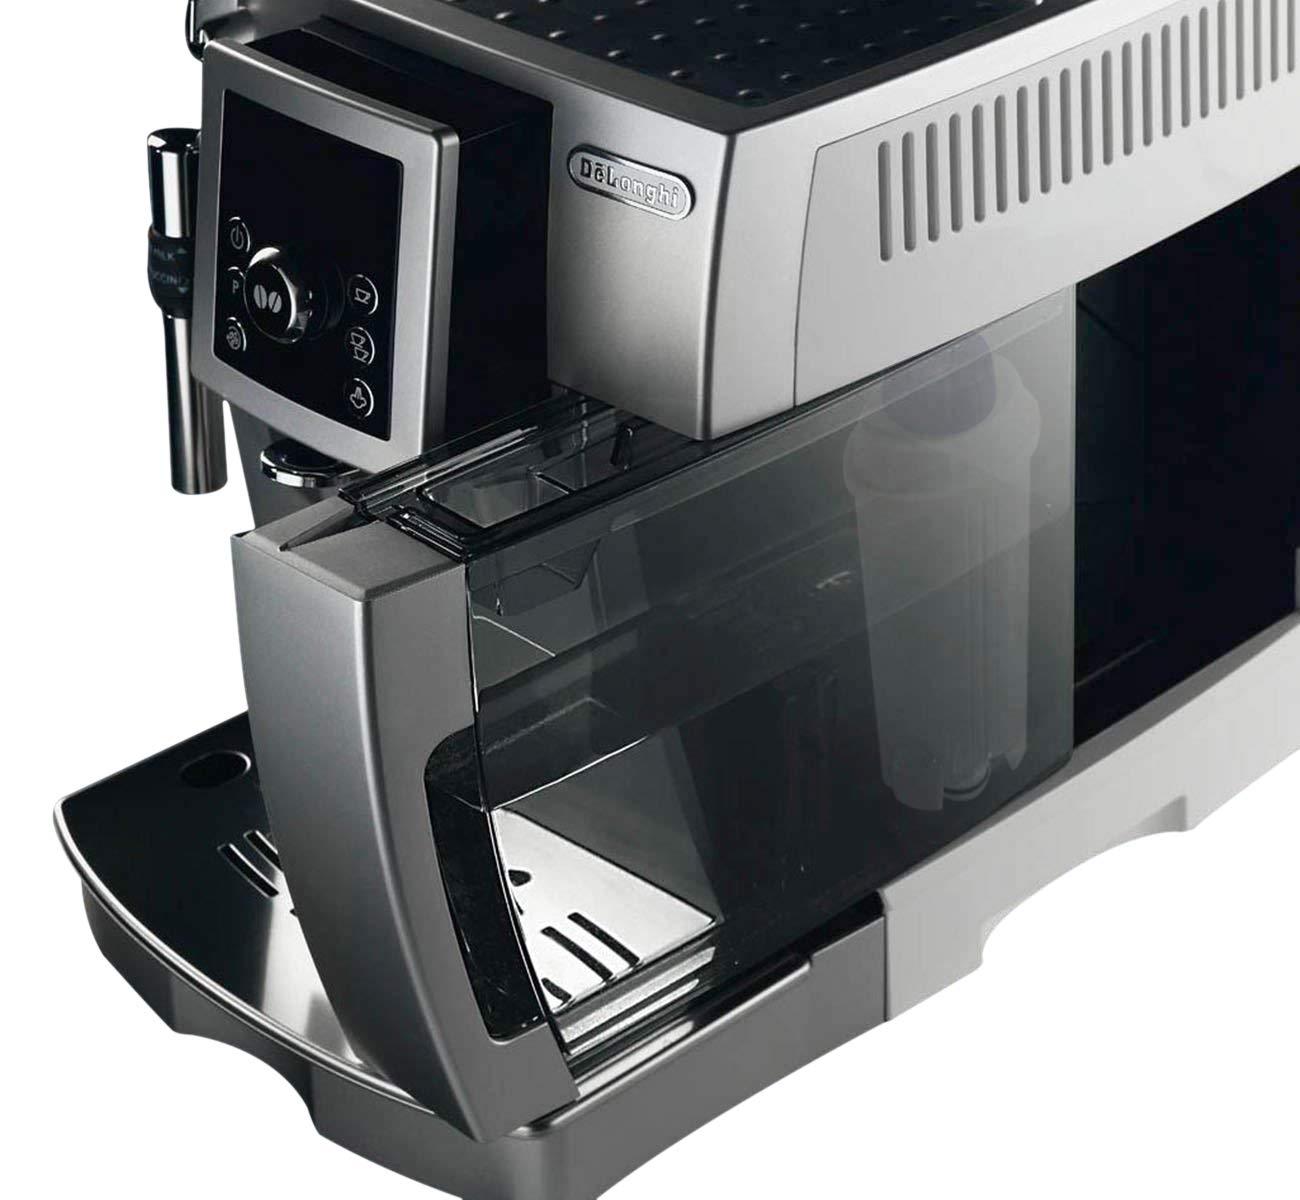 Wei/ß 2er Wasserfilter f/ür Delonghi Kaffeevollautomaten Filterpatronen Zubeh/ör kompatibel f/ür DeLonghi Kaffeemaschinen ECAM ESAM BCO EC ETAM usw